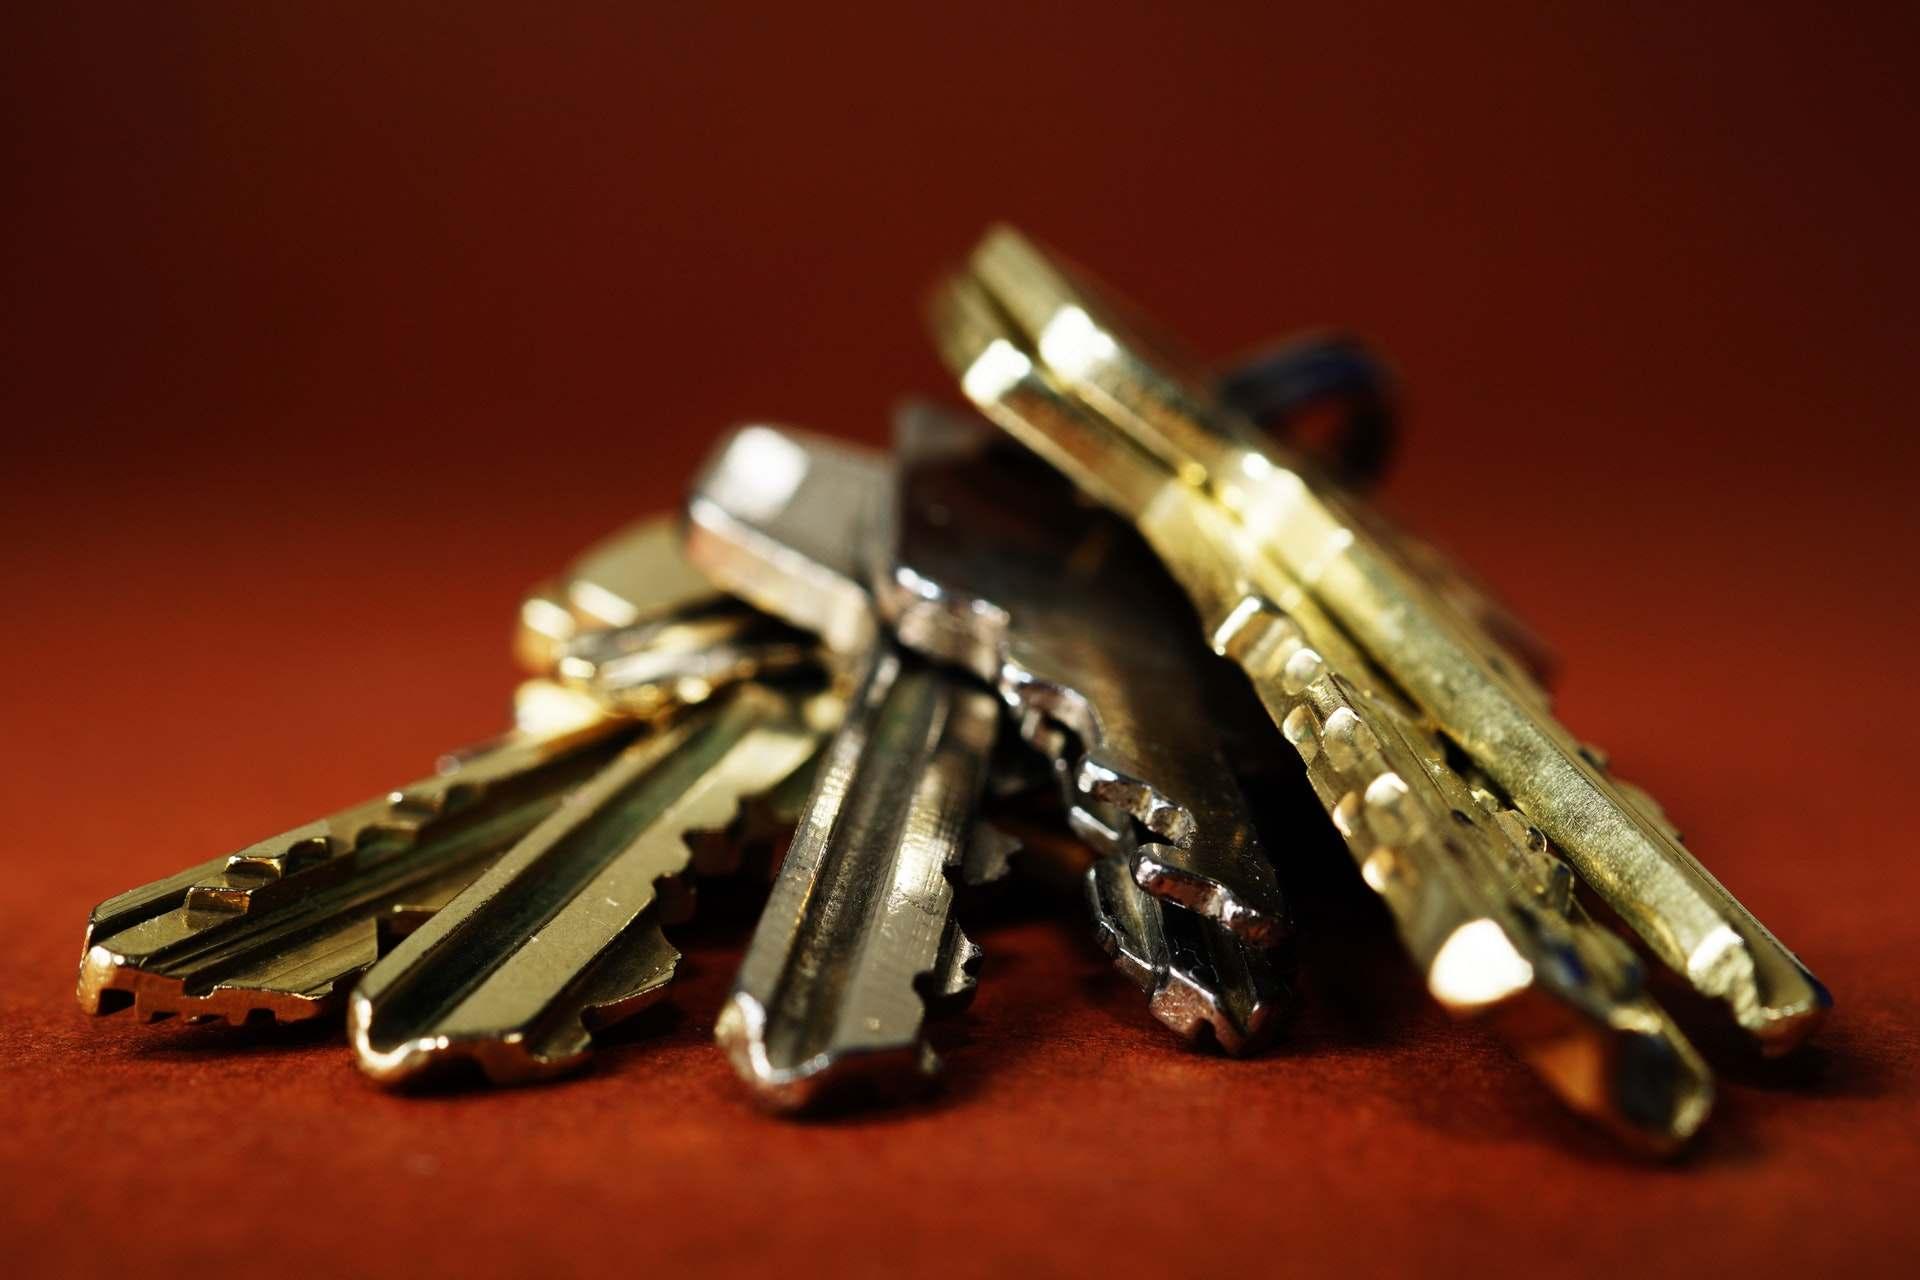 Plano locksmith services is reasonably priced